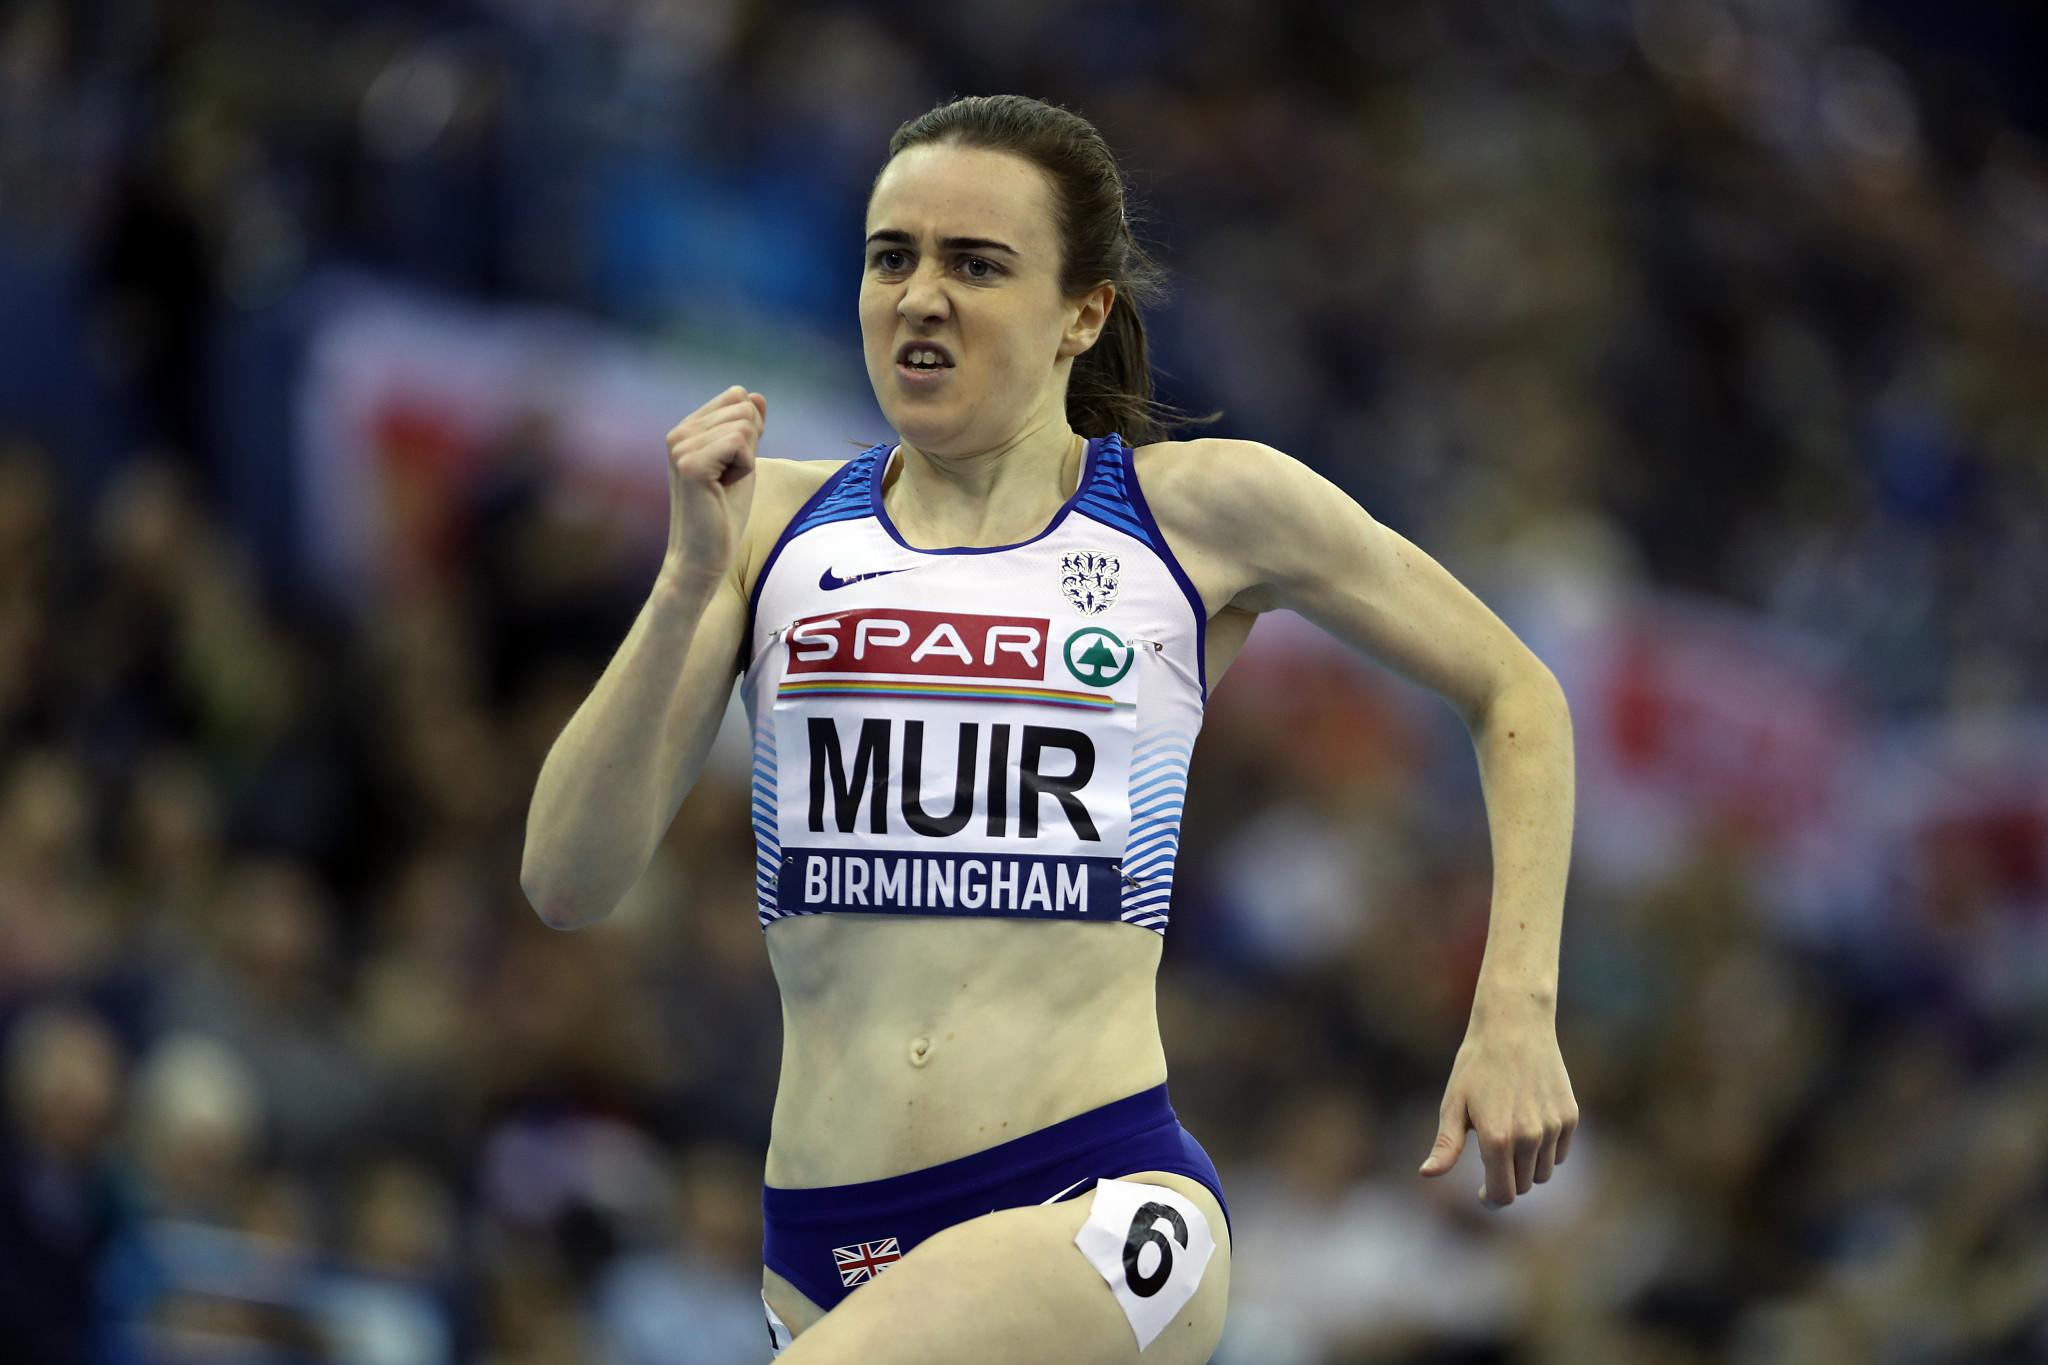 Muir heads British hopes at IAAF World Indoor Tour in Birmingham